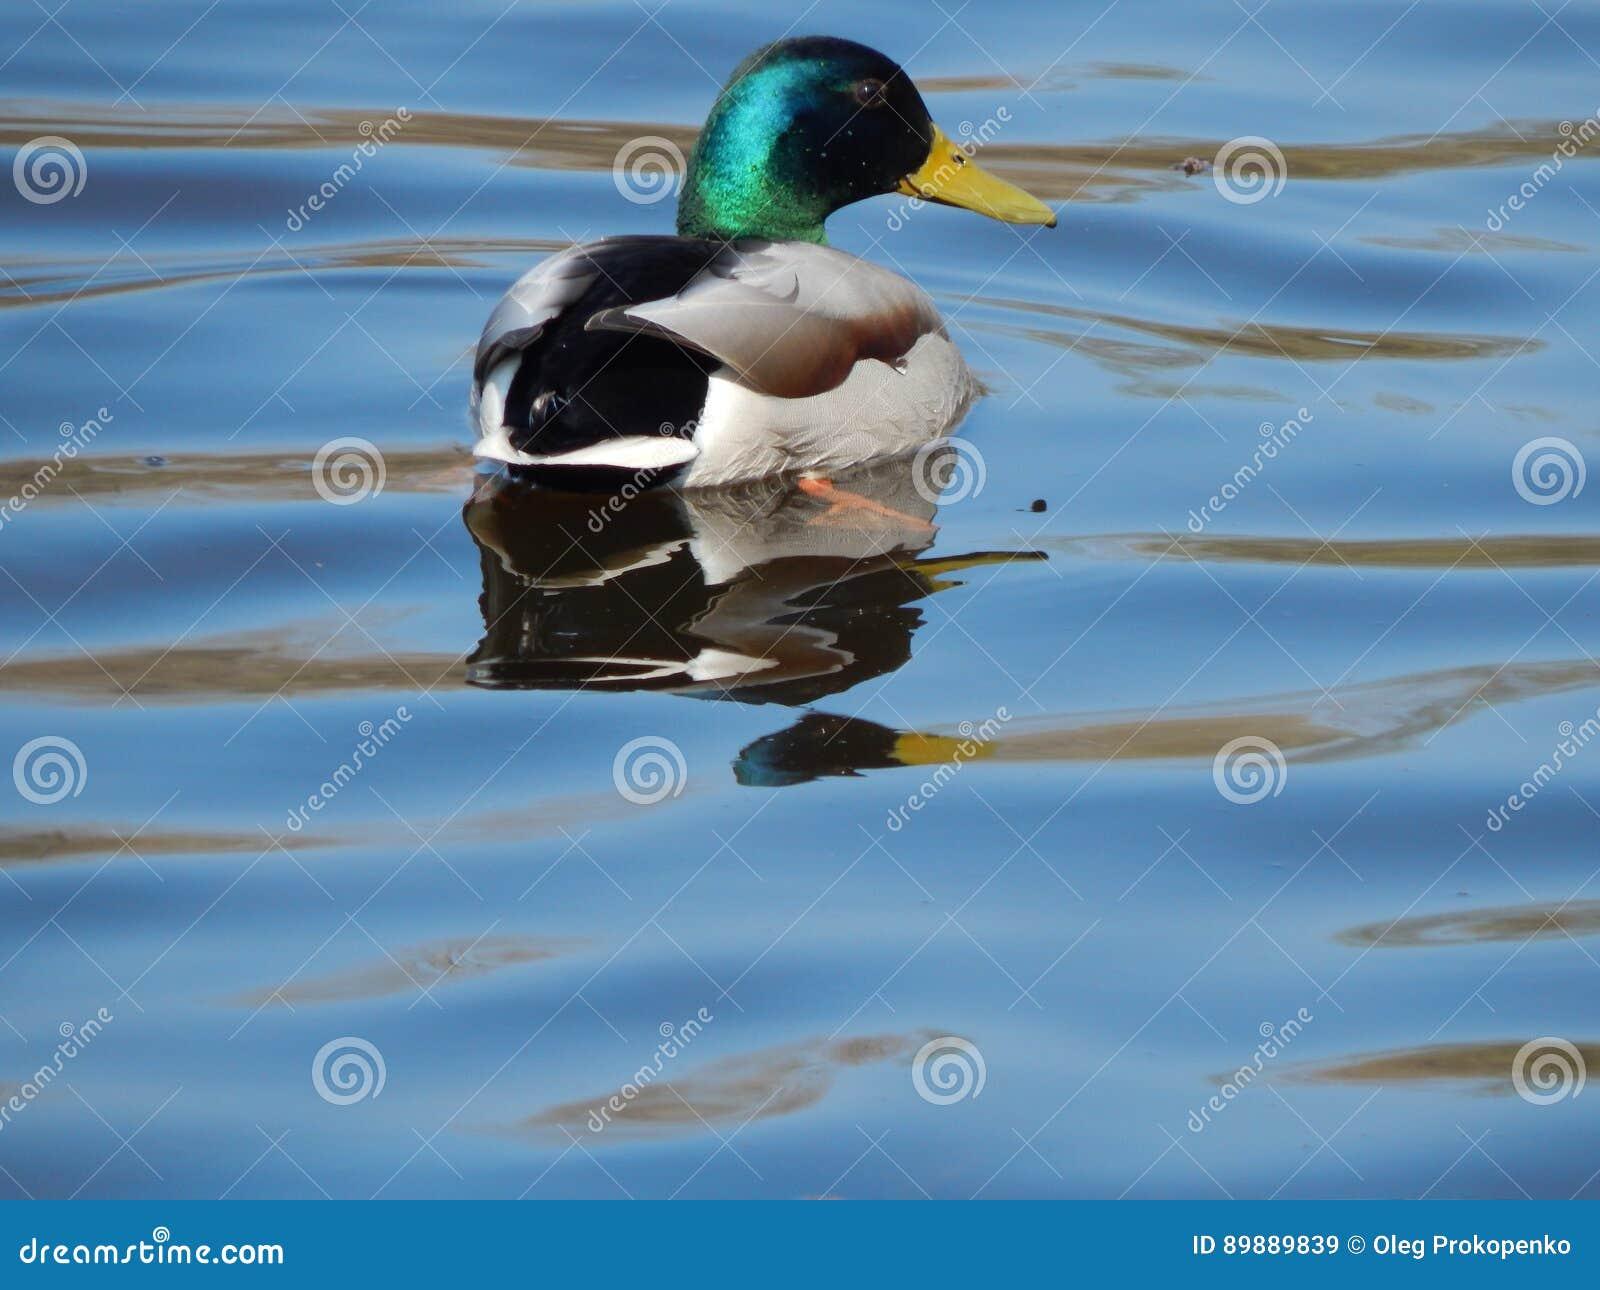 Ducks Swimming On The Water Stock Photo - Image: 89889839